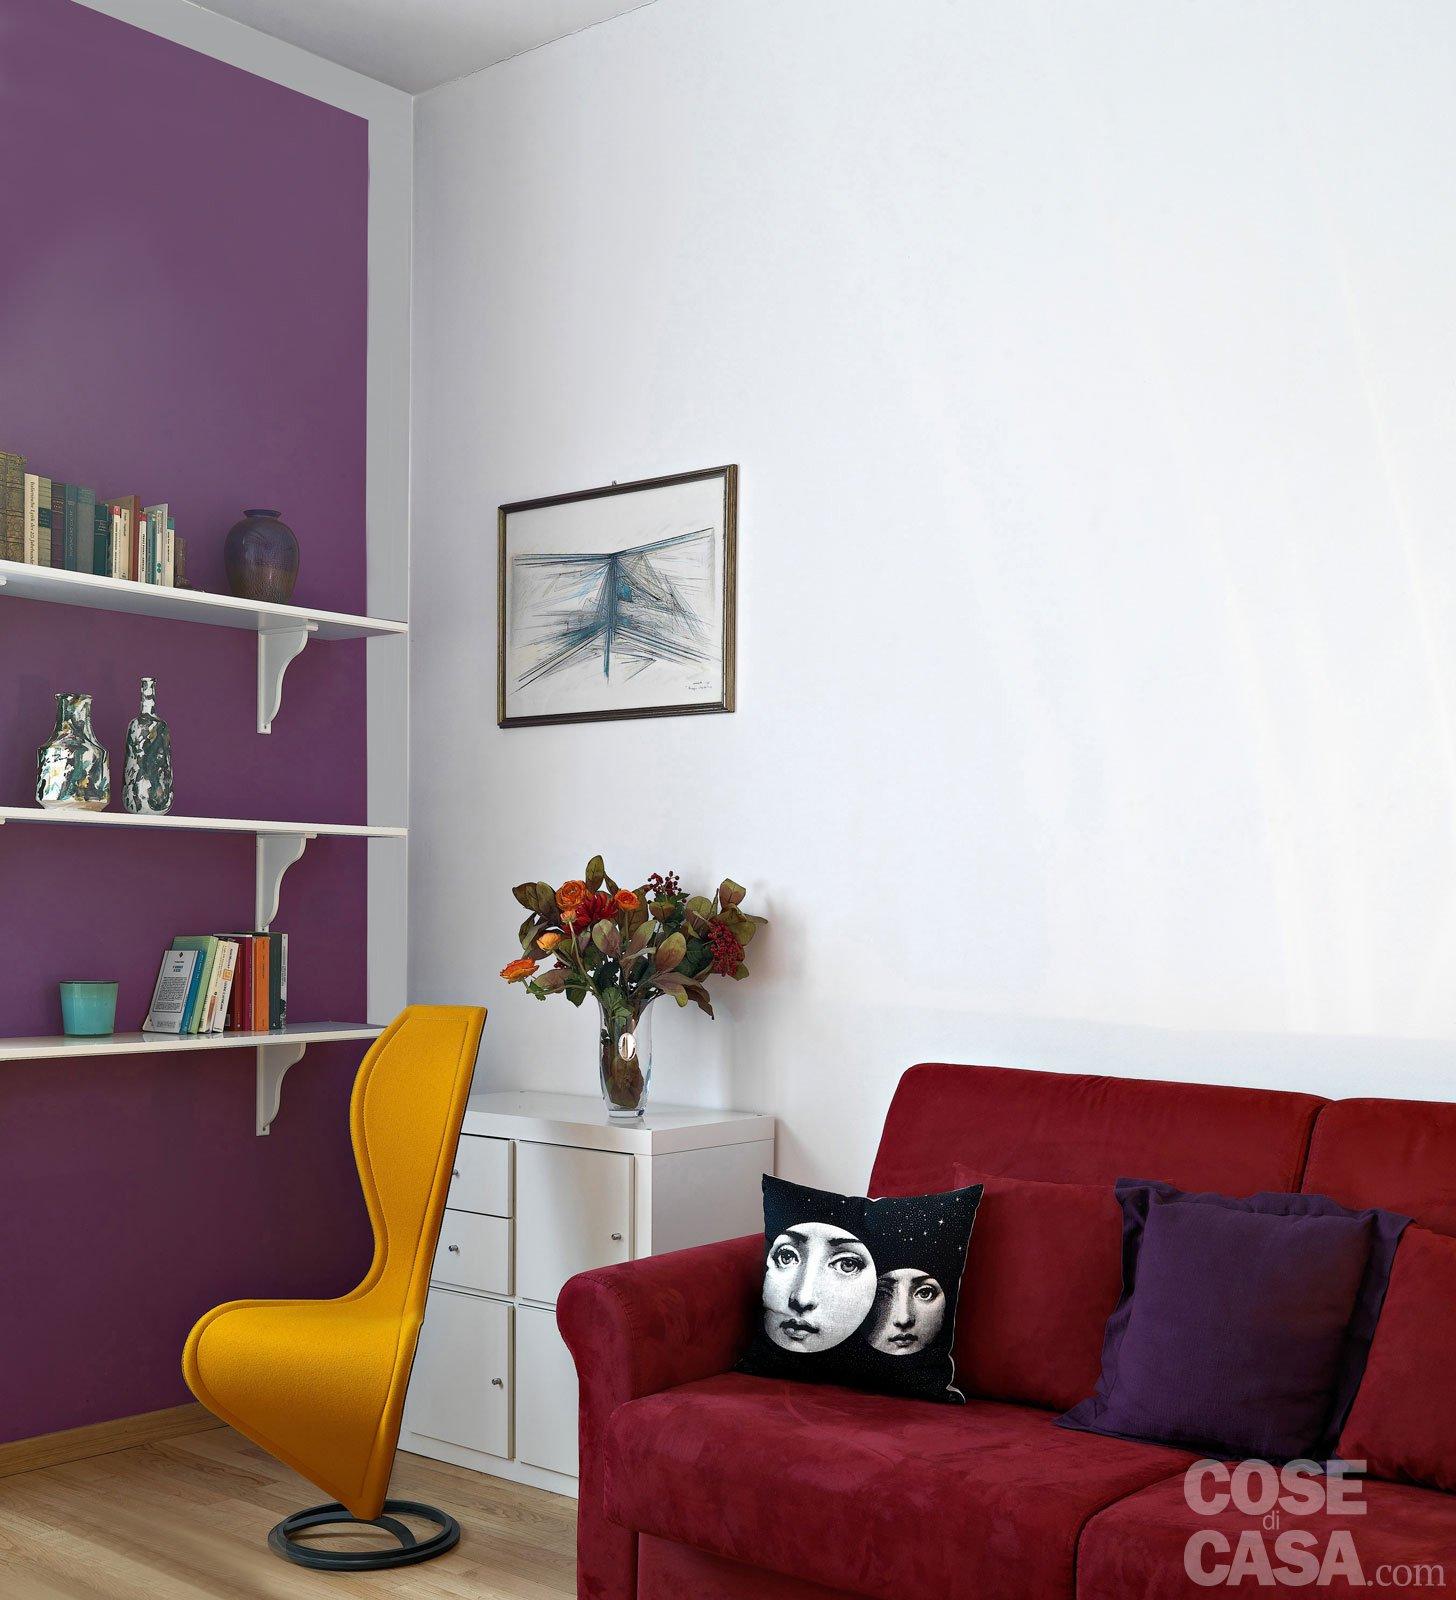 Pareti Pitturate A Fasce pitturare le pareti: i trucchi che ingannano l'occhio - cose